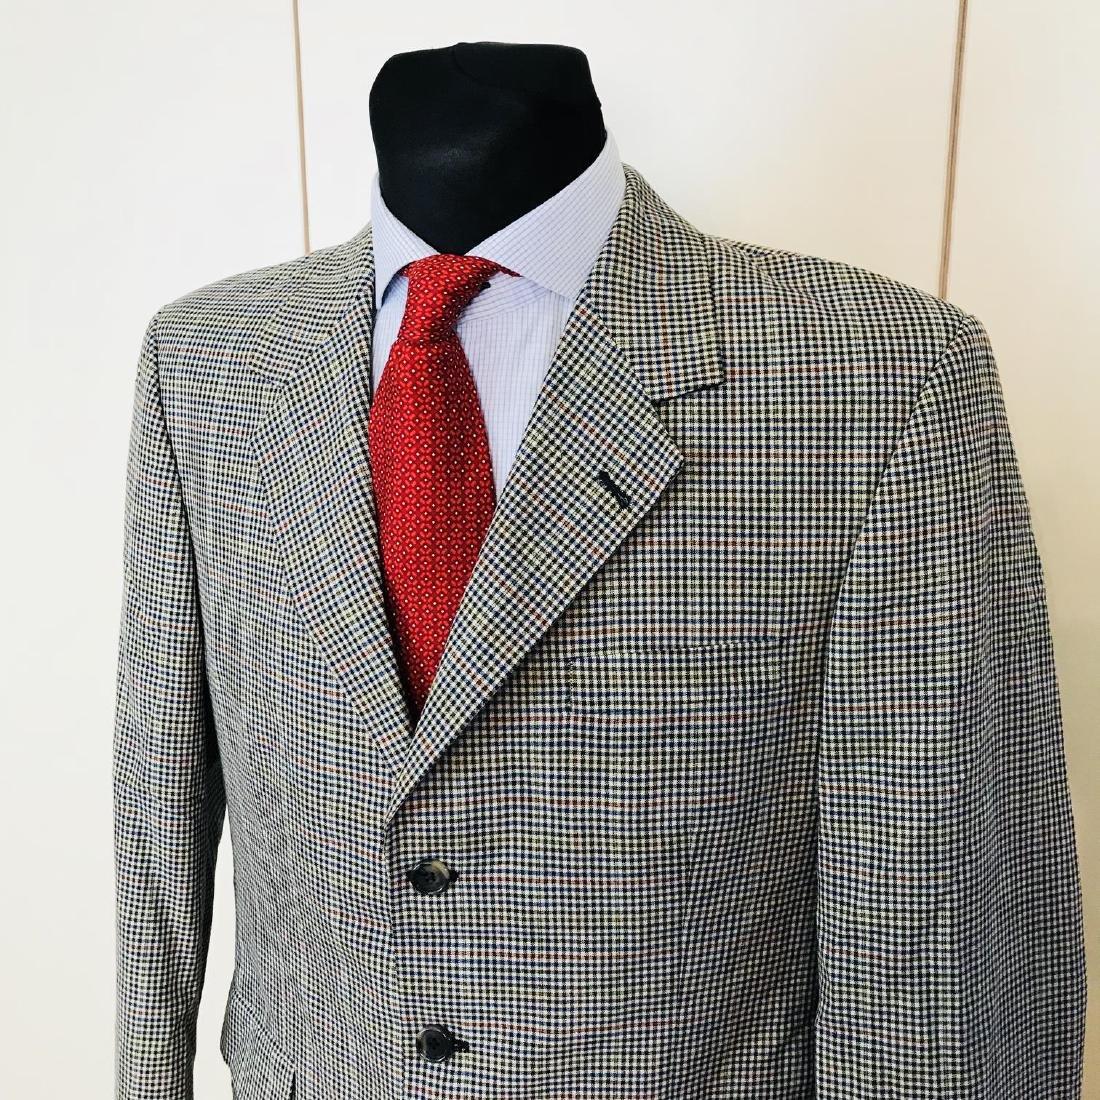 Vintage Men's Paolo Negrato Jacket Blazer Size US 40 - 2